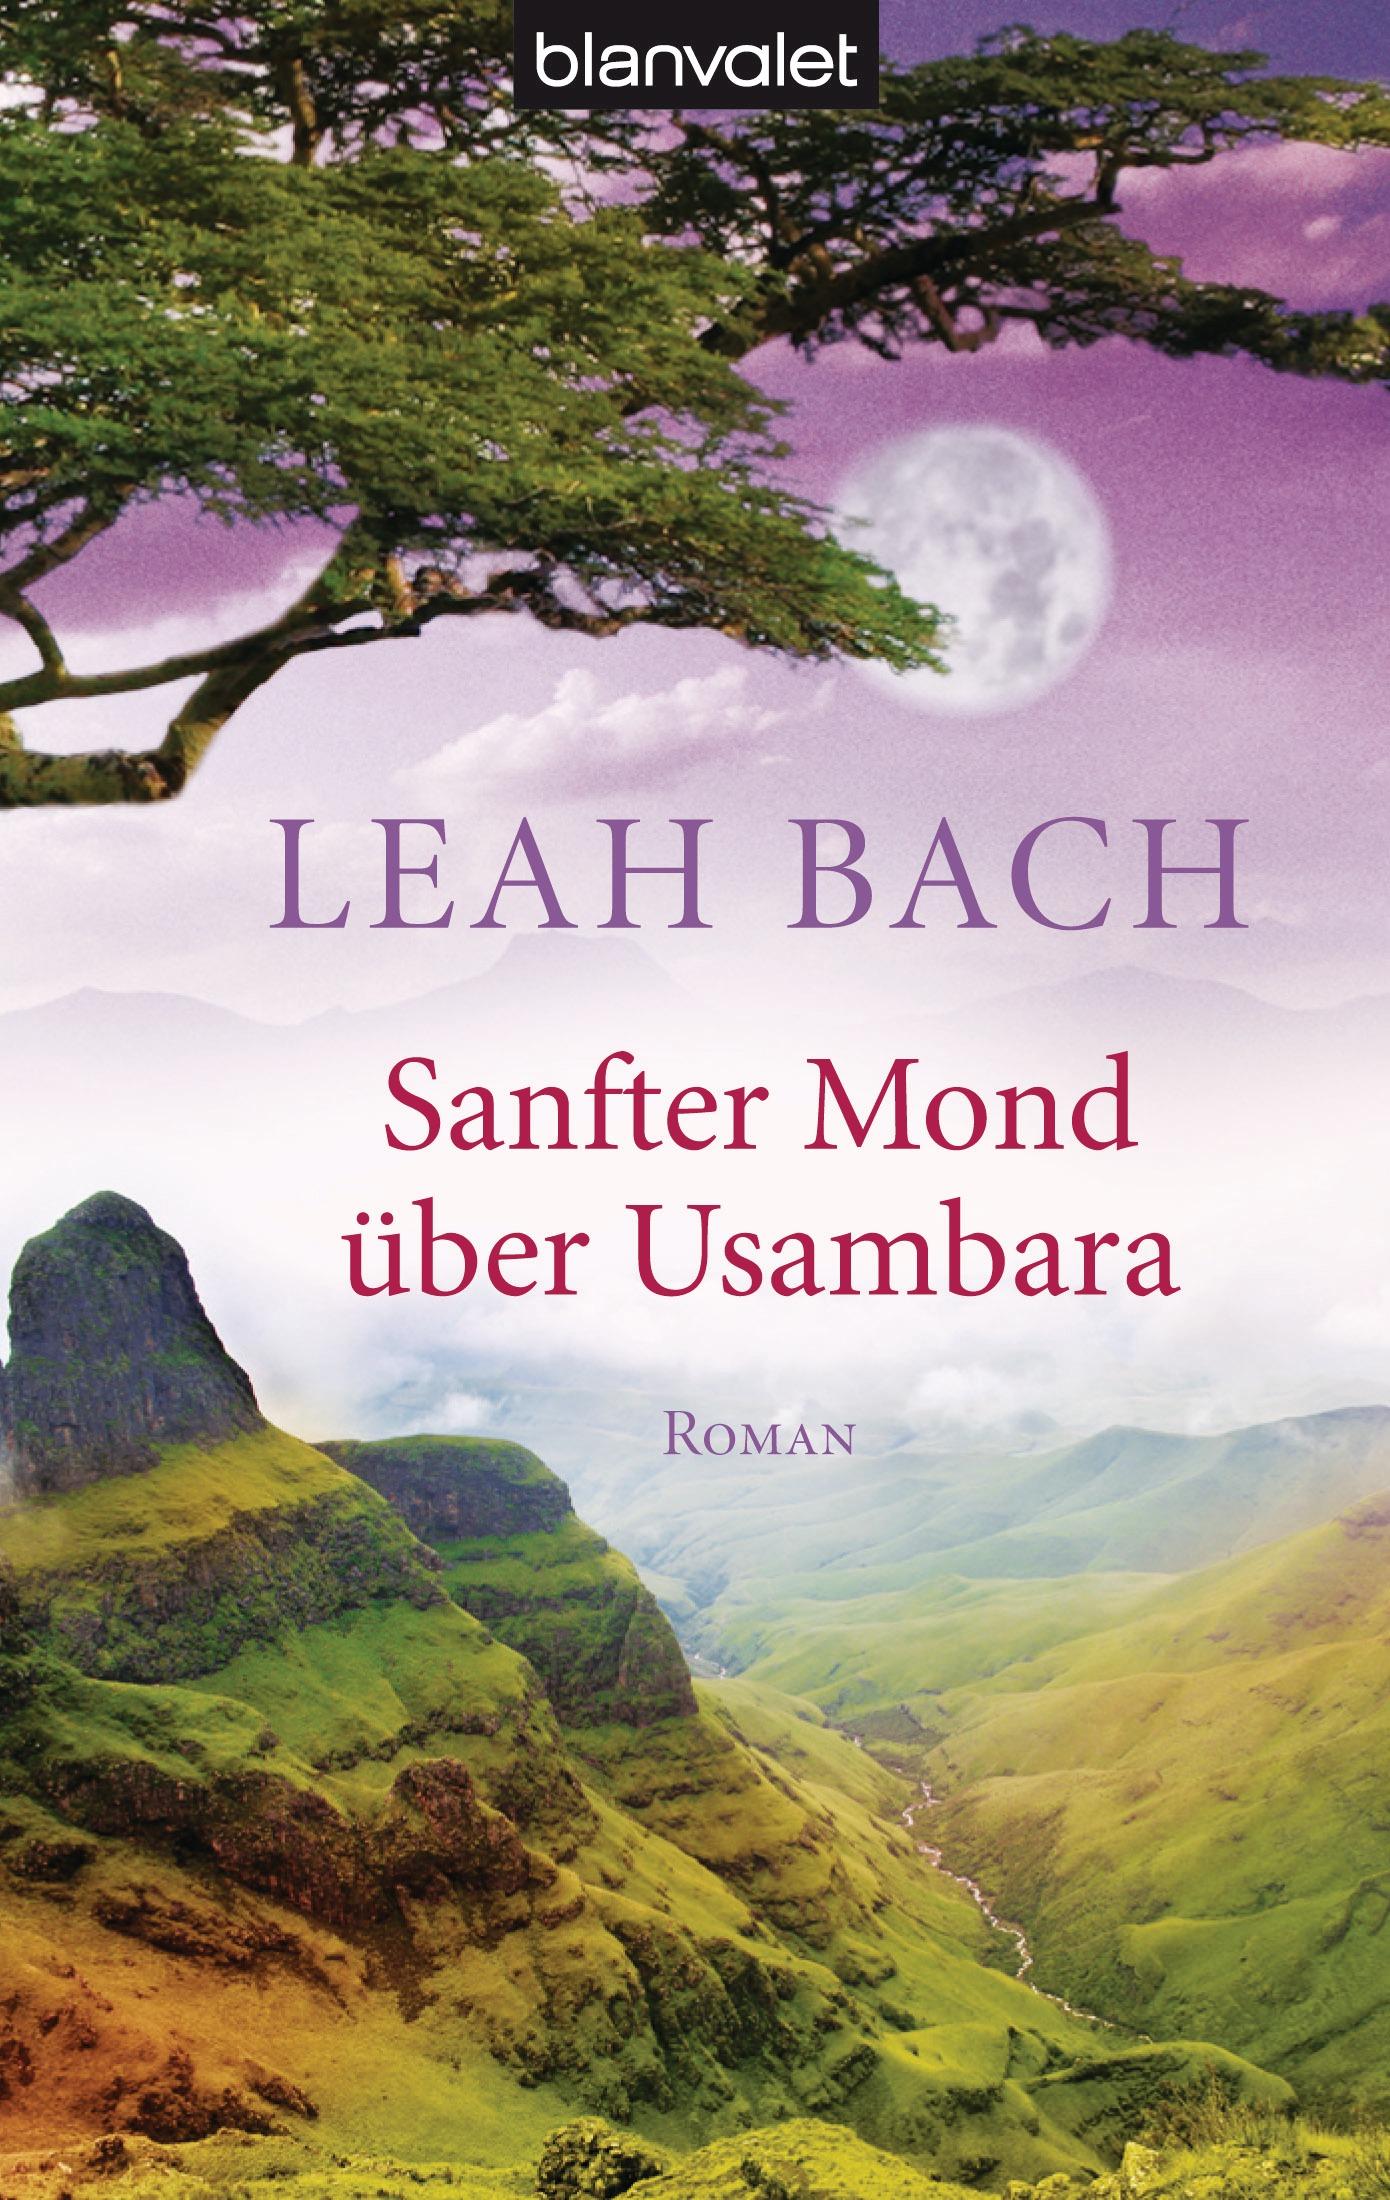 Sanfter Mond über Usambara - Leah Bach